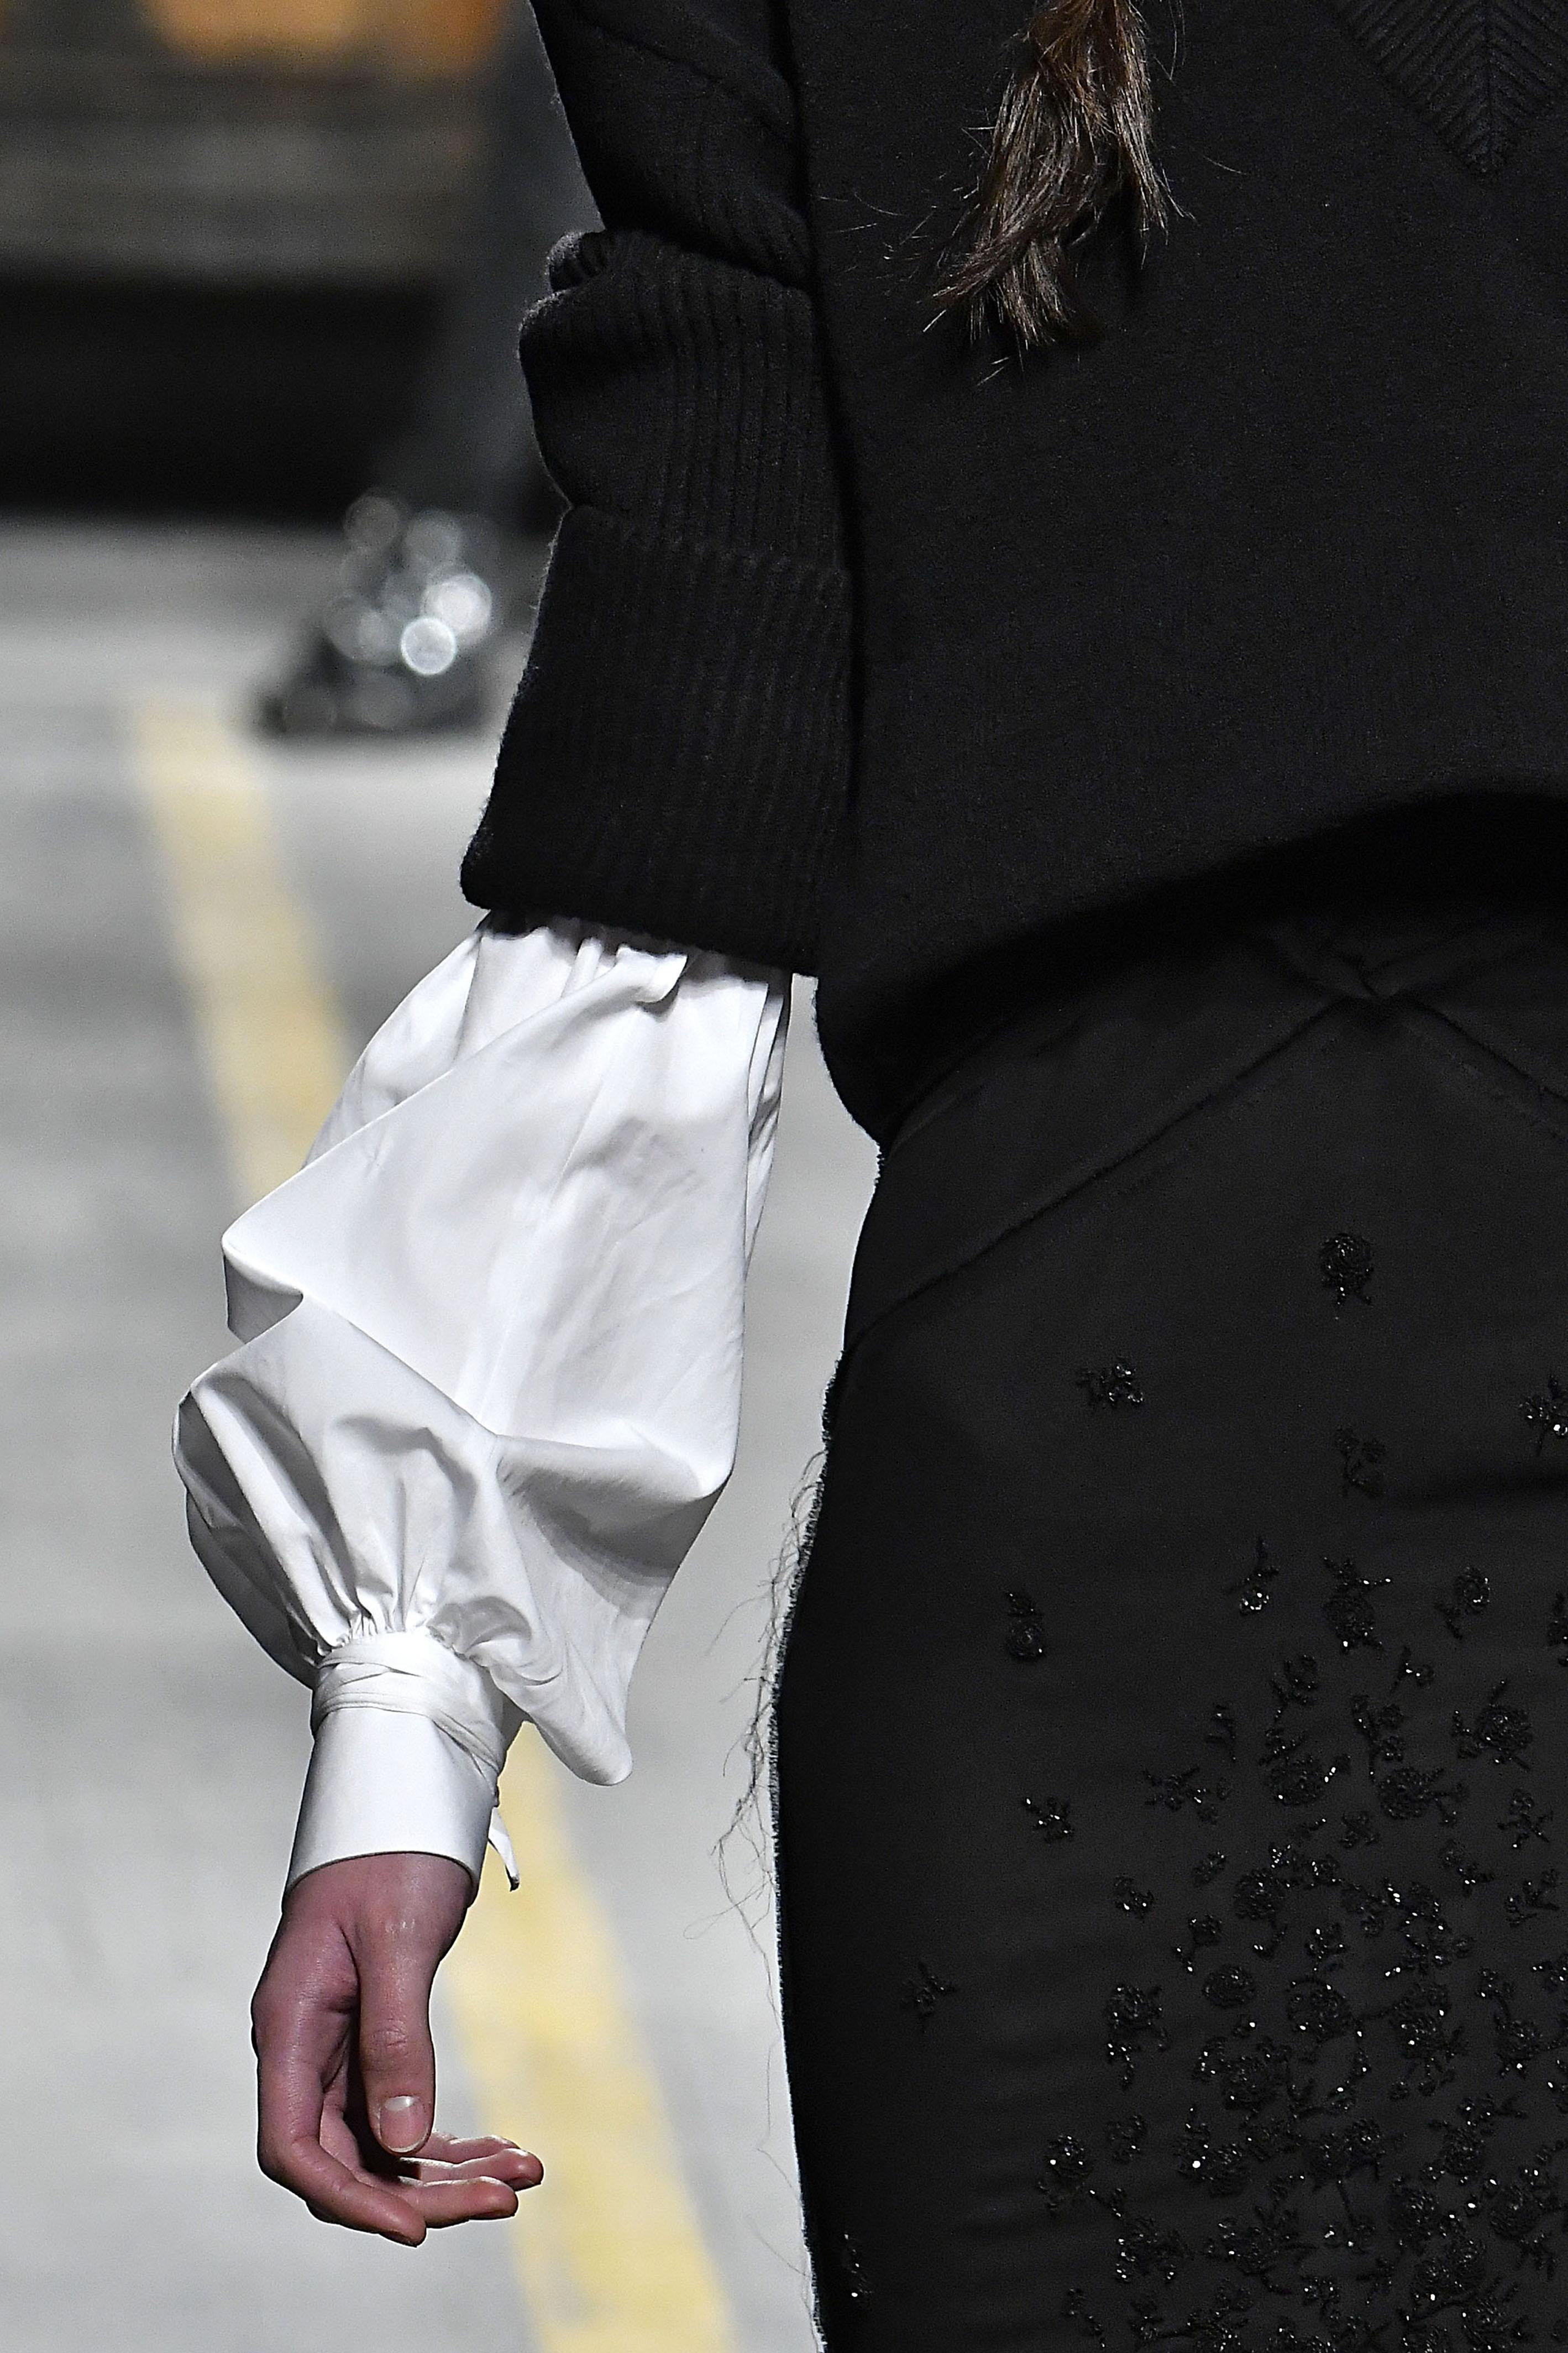 Dsquared2 - Runway - Milan Men's Fashion Week Fall/Winter 2017/18